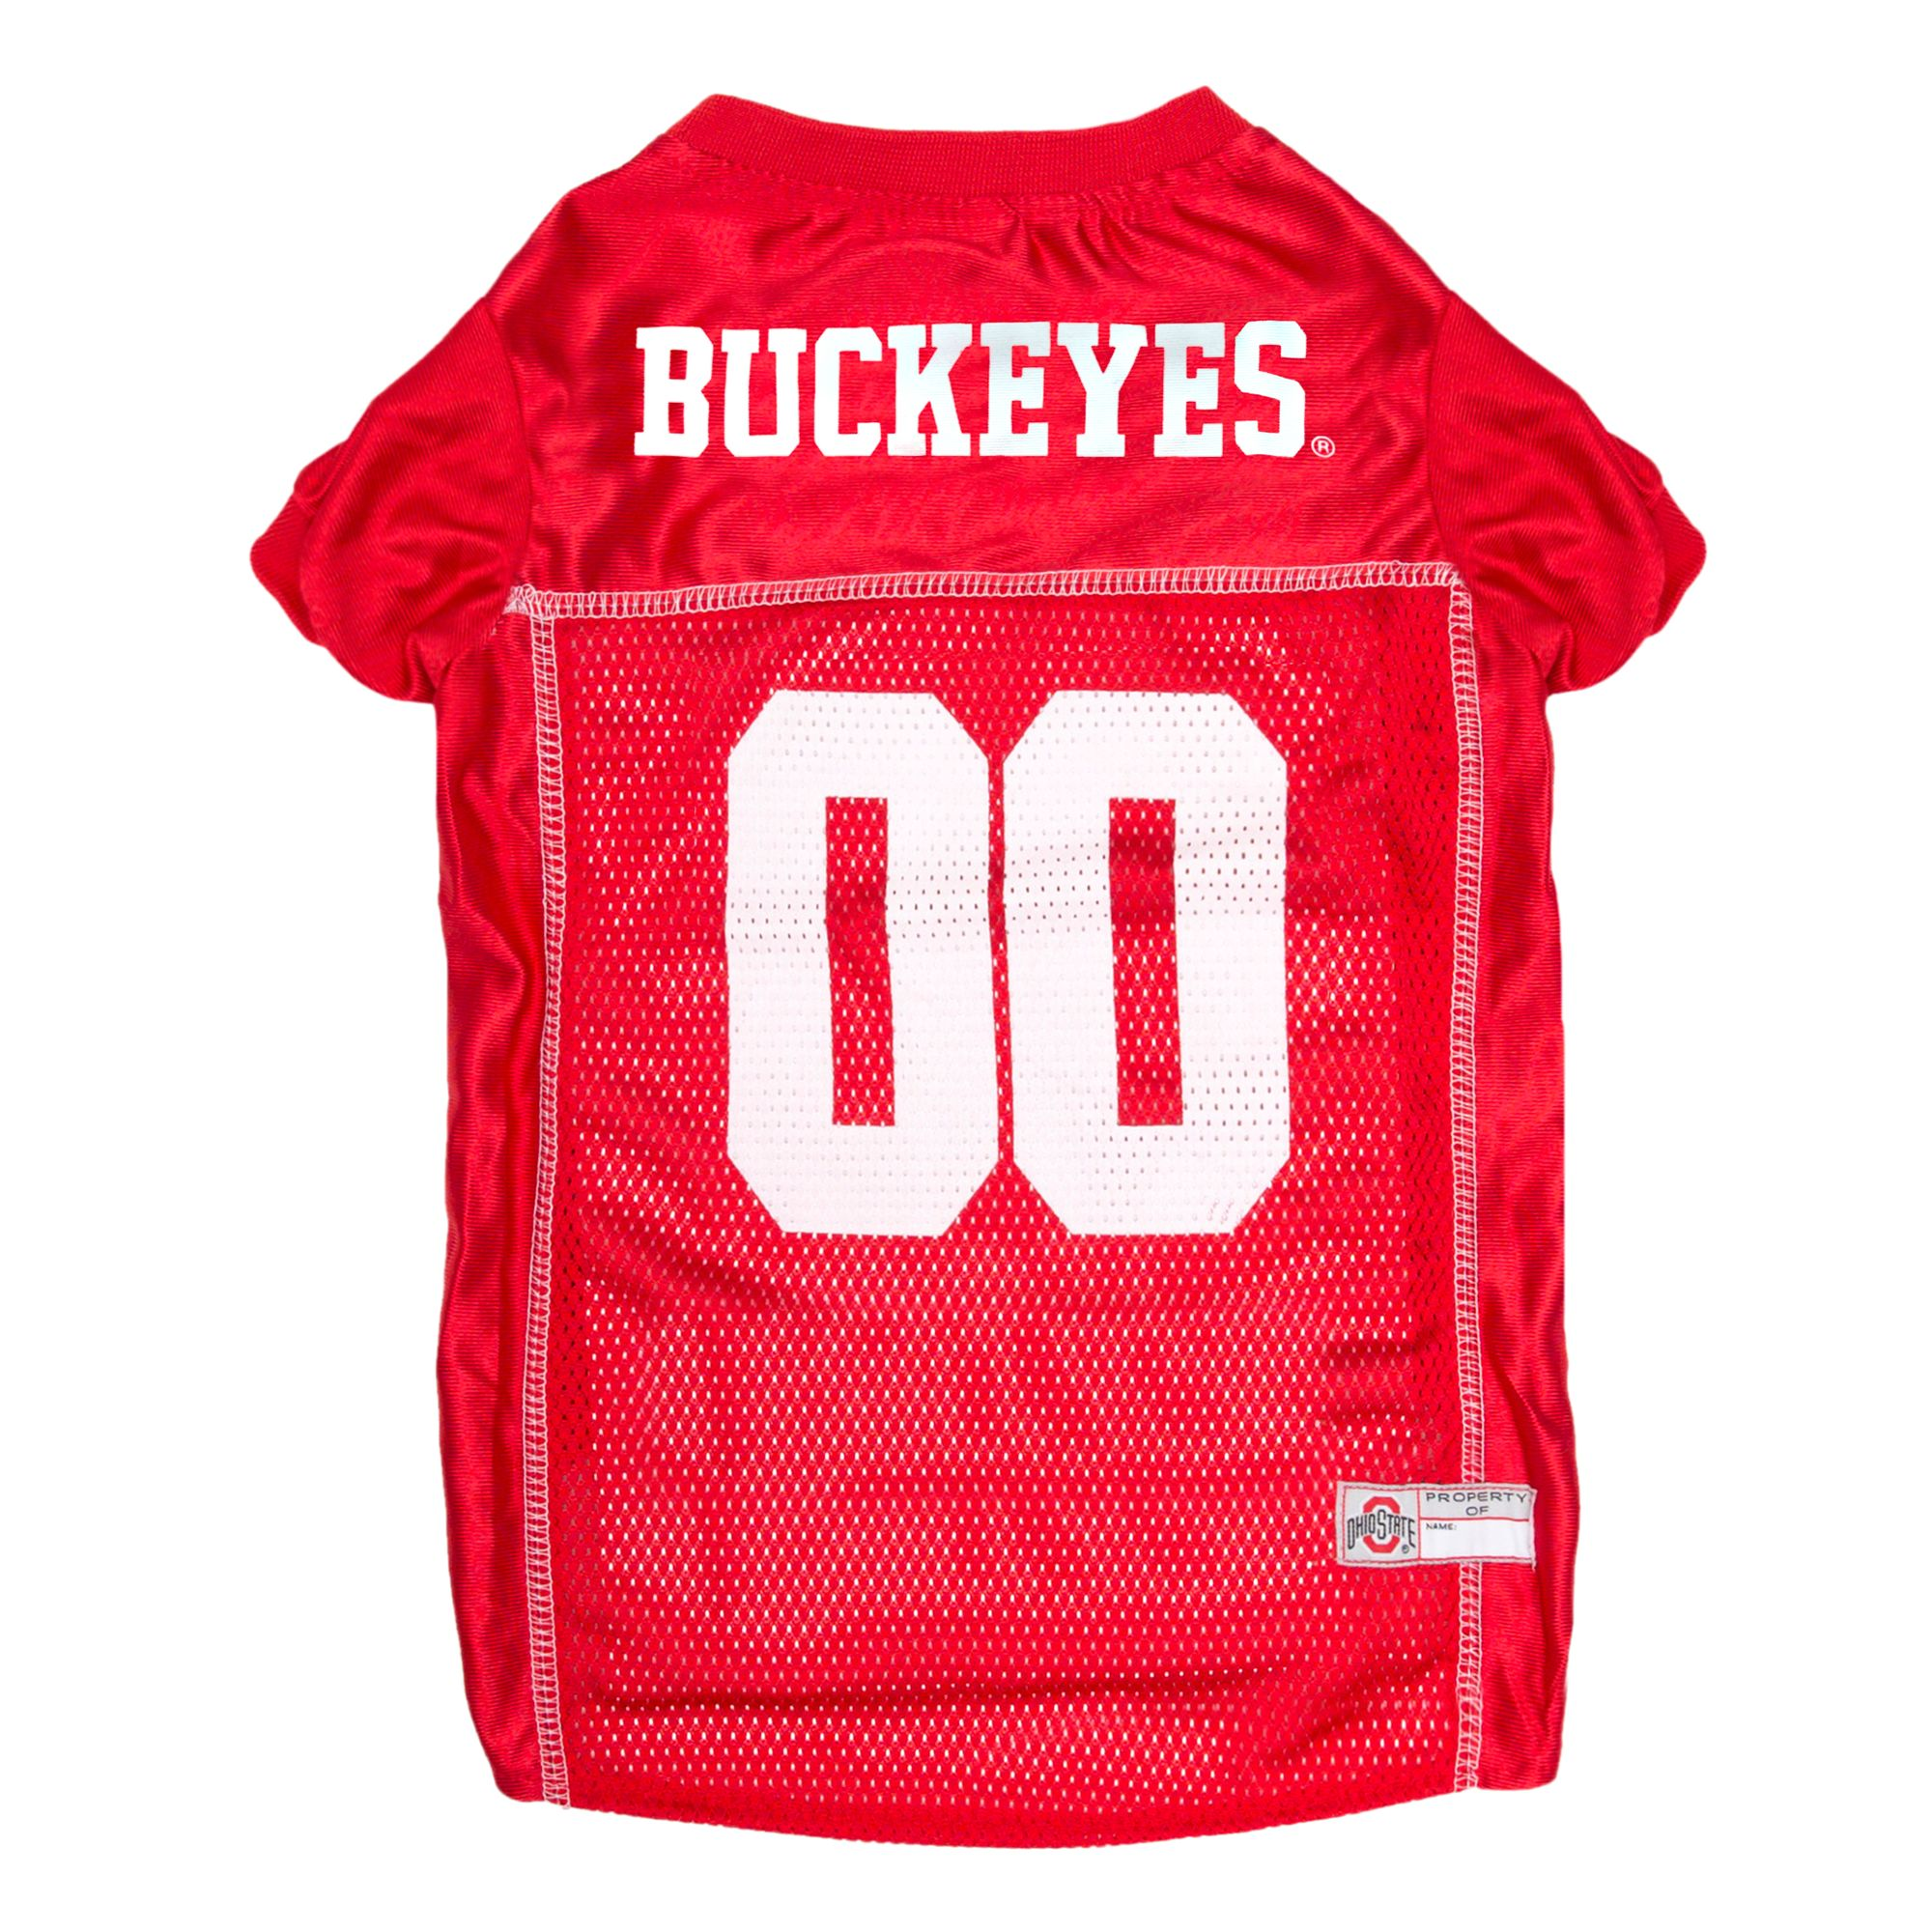 Ohio State University Buckeyes Ncaa Jersey size: X Large 5259006